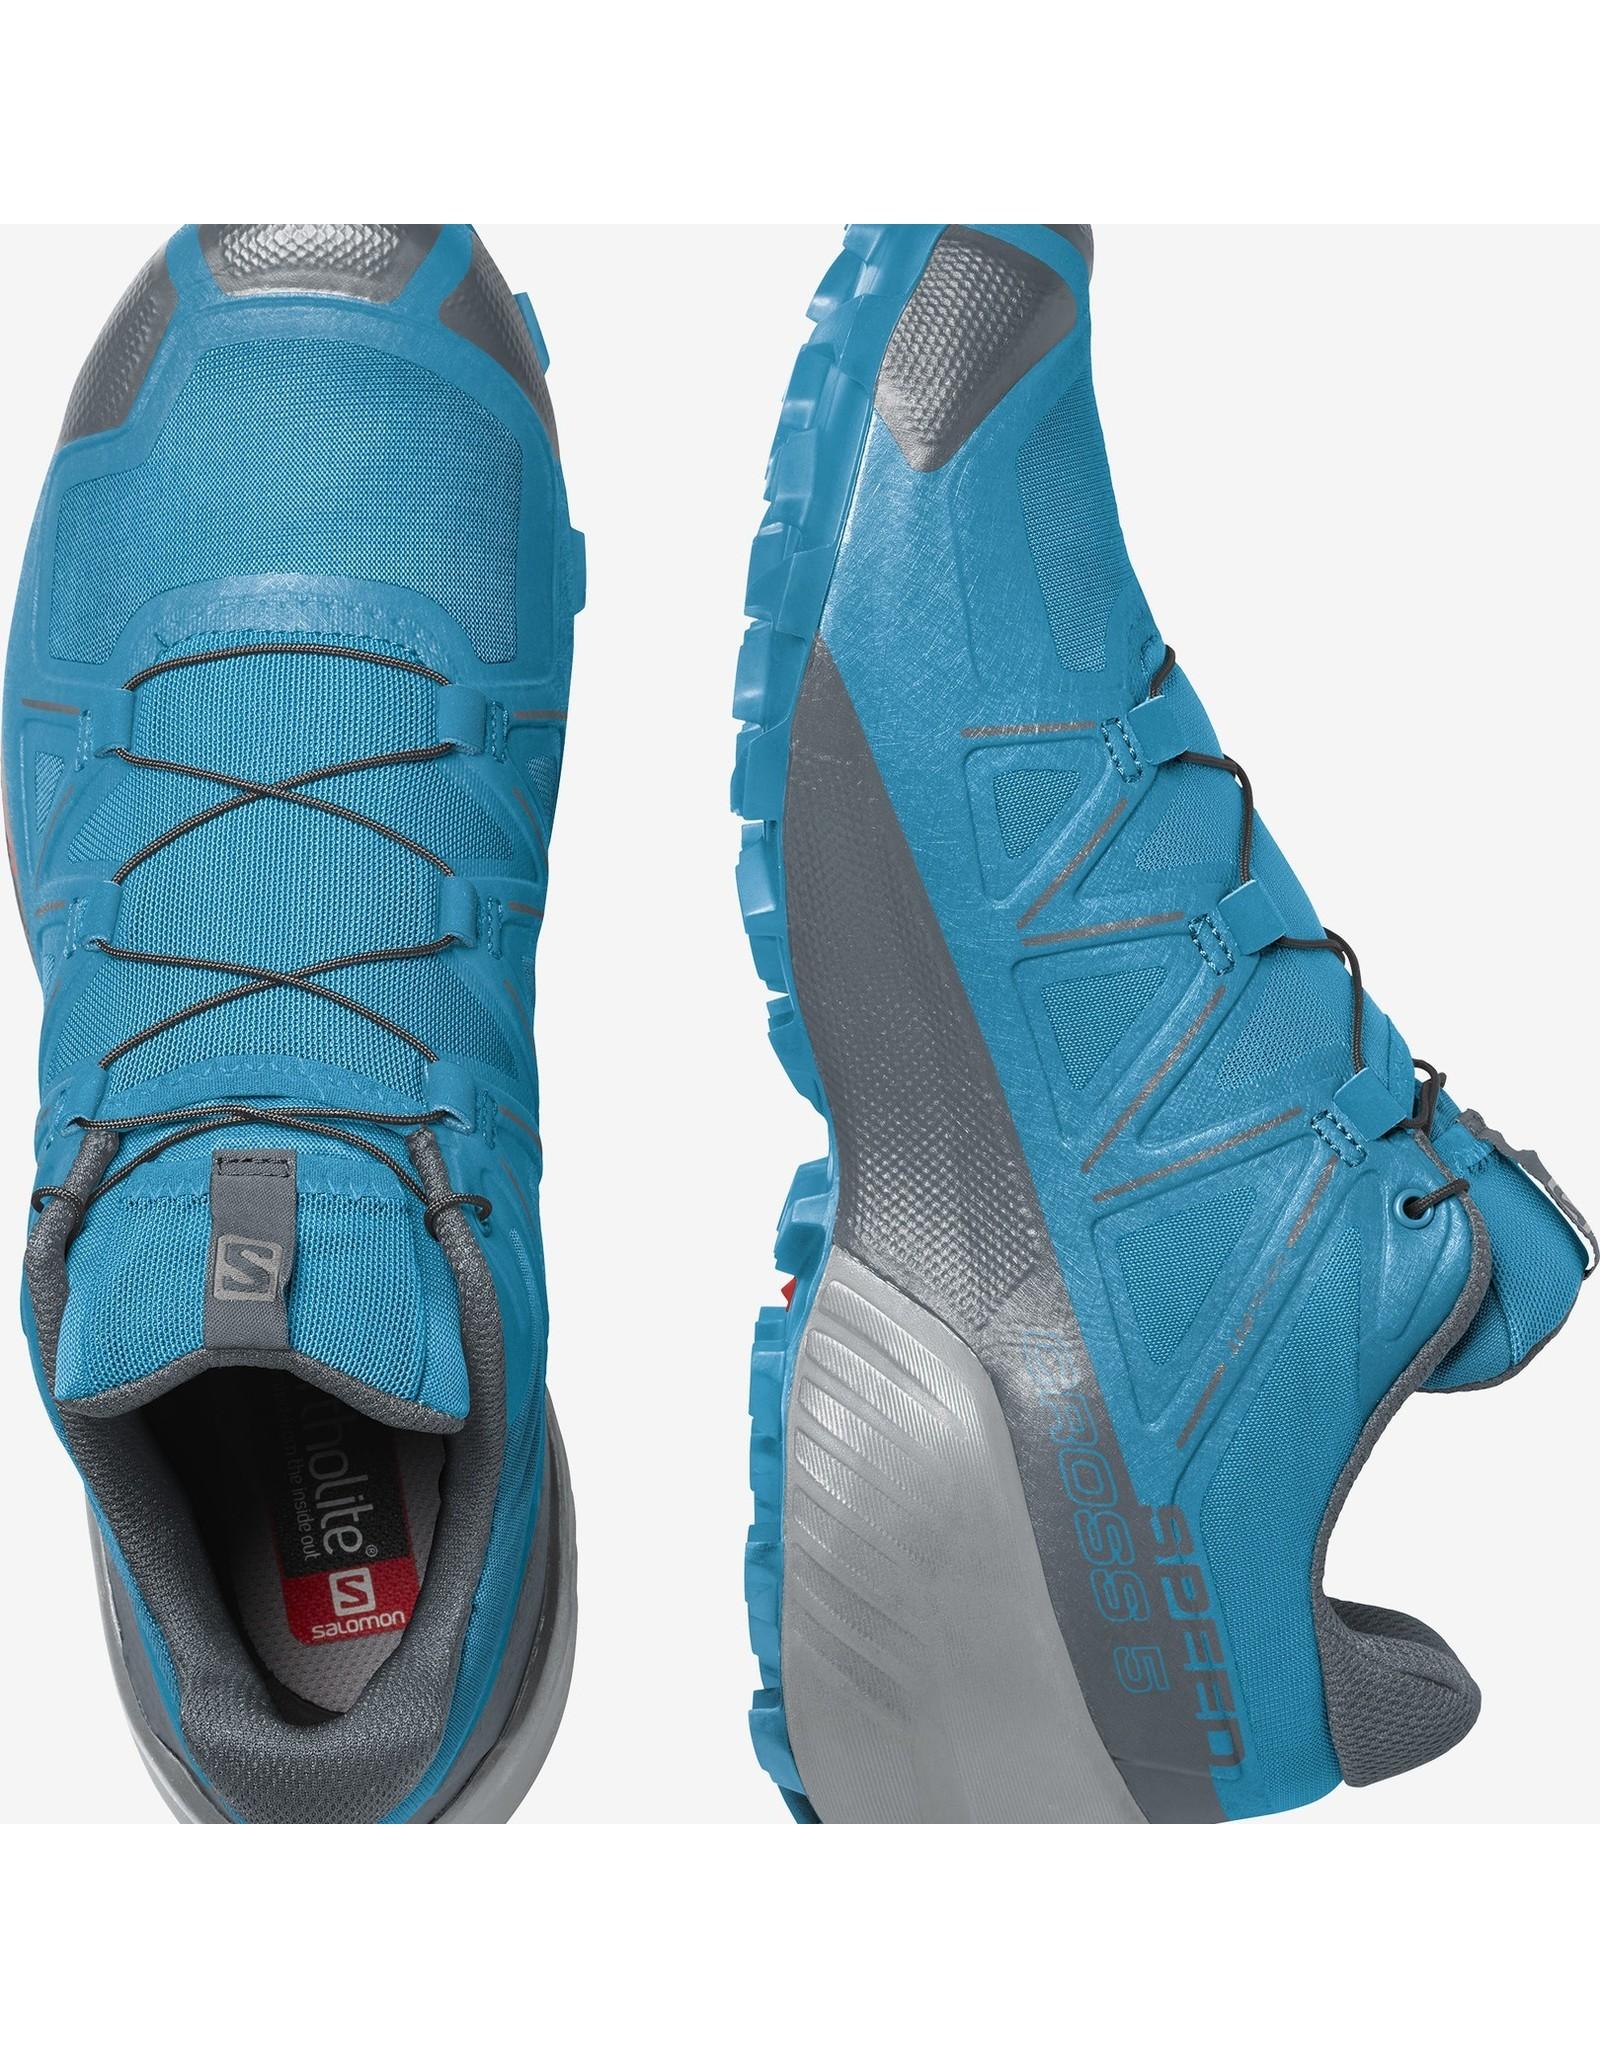 Salomon Salomon Speedcross 5 Men's Trail Running Shoes